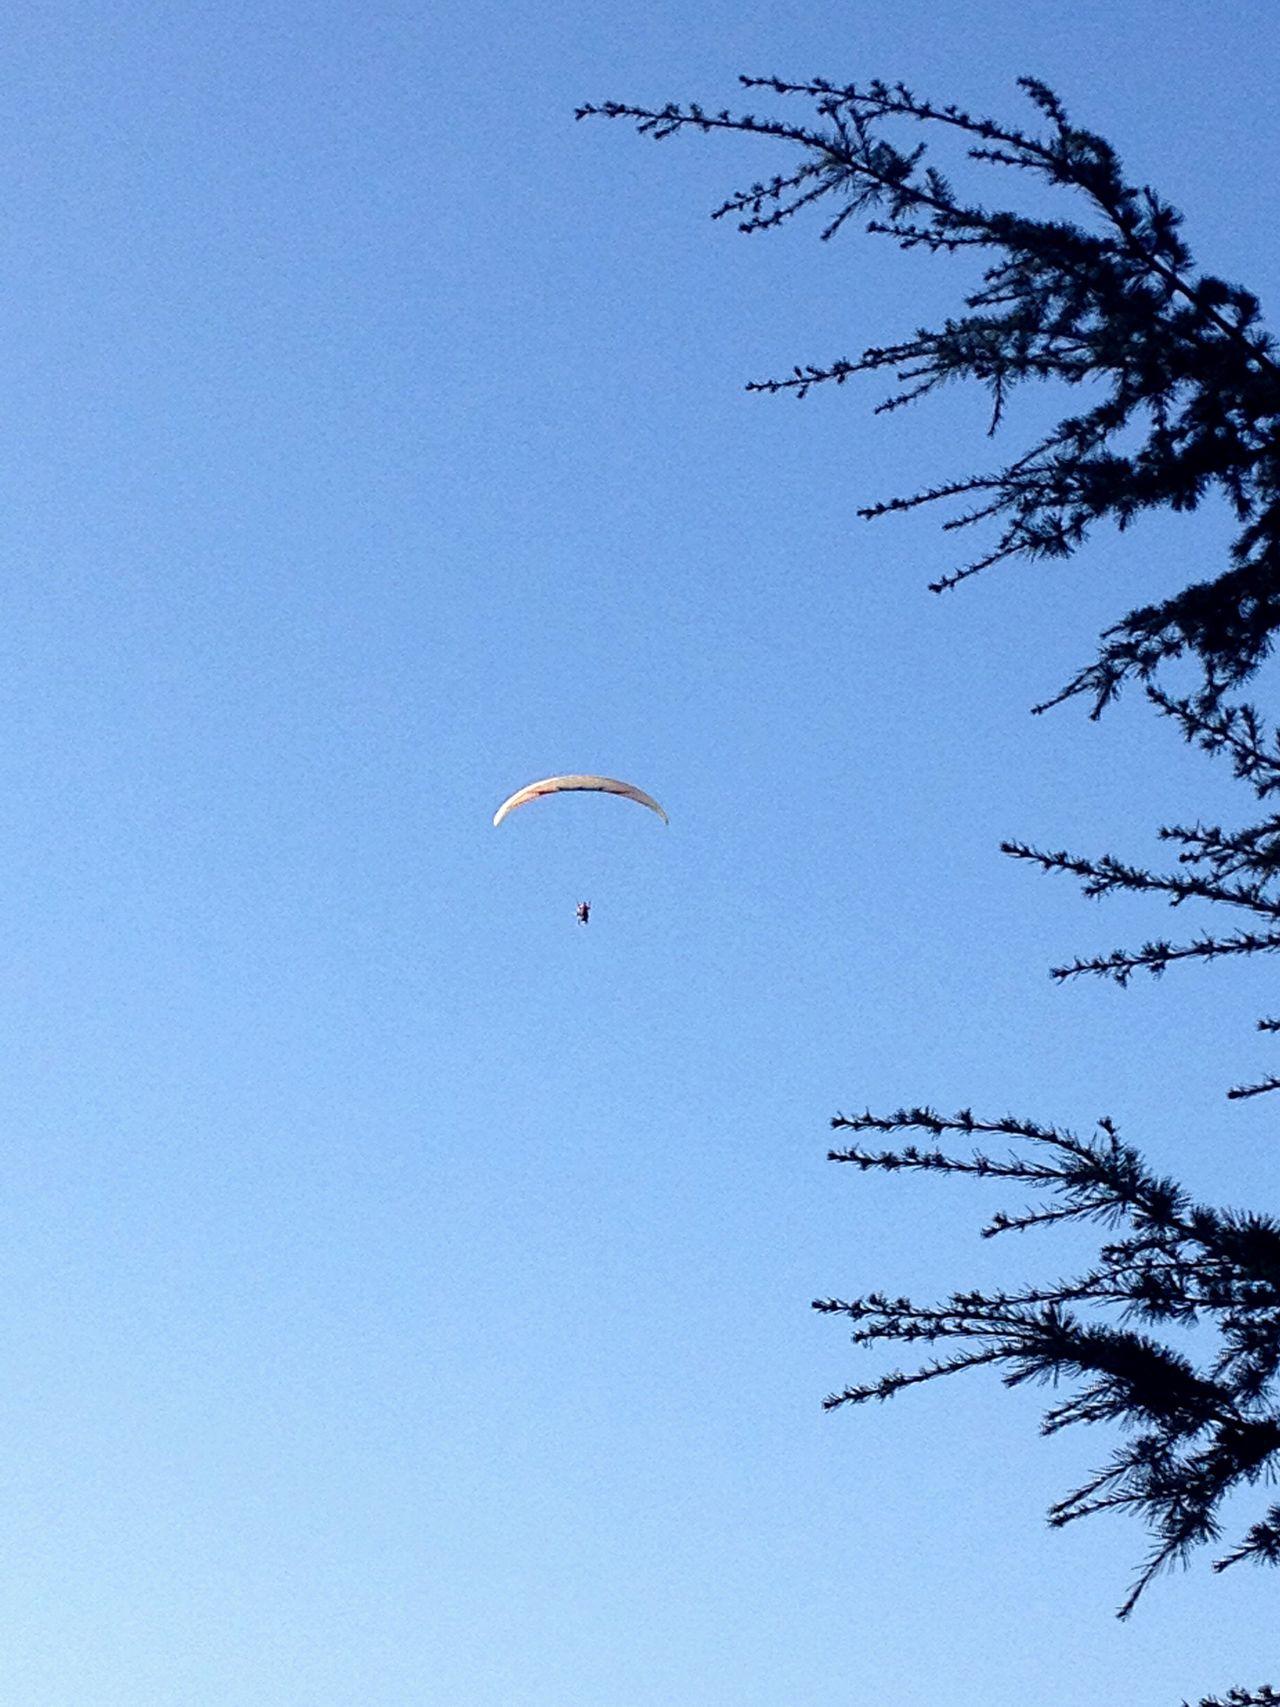 Parasailing Blue Sky Tree And Sky Harrisa Paragliding Lebanon